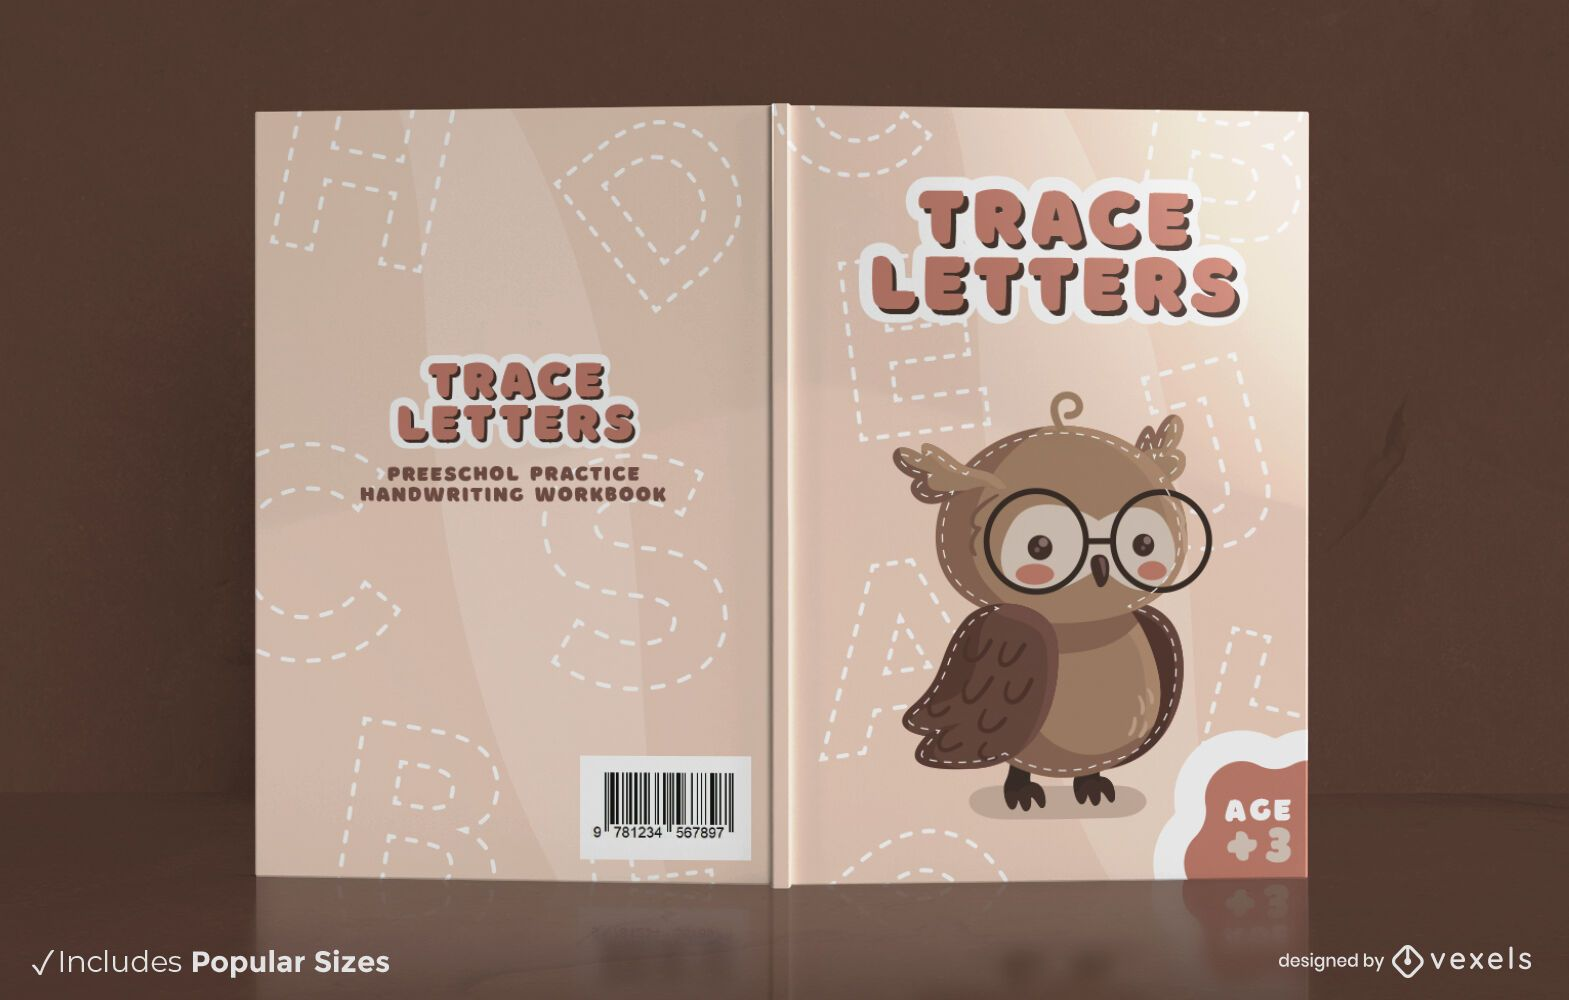 Handwriting practice book cover design